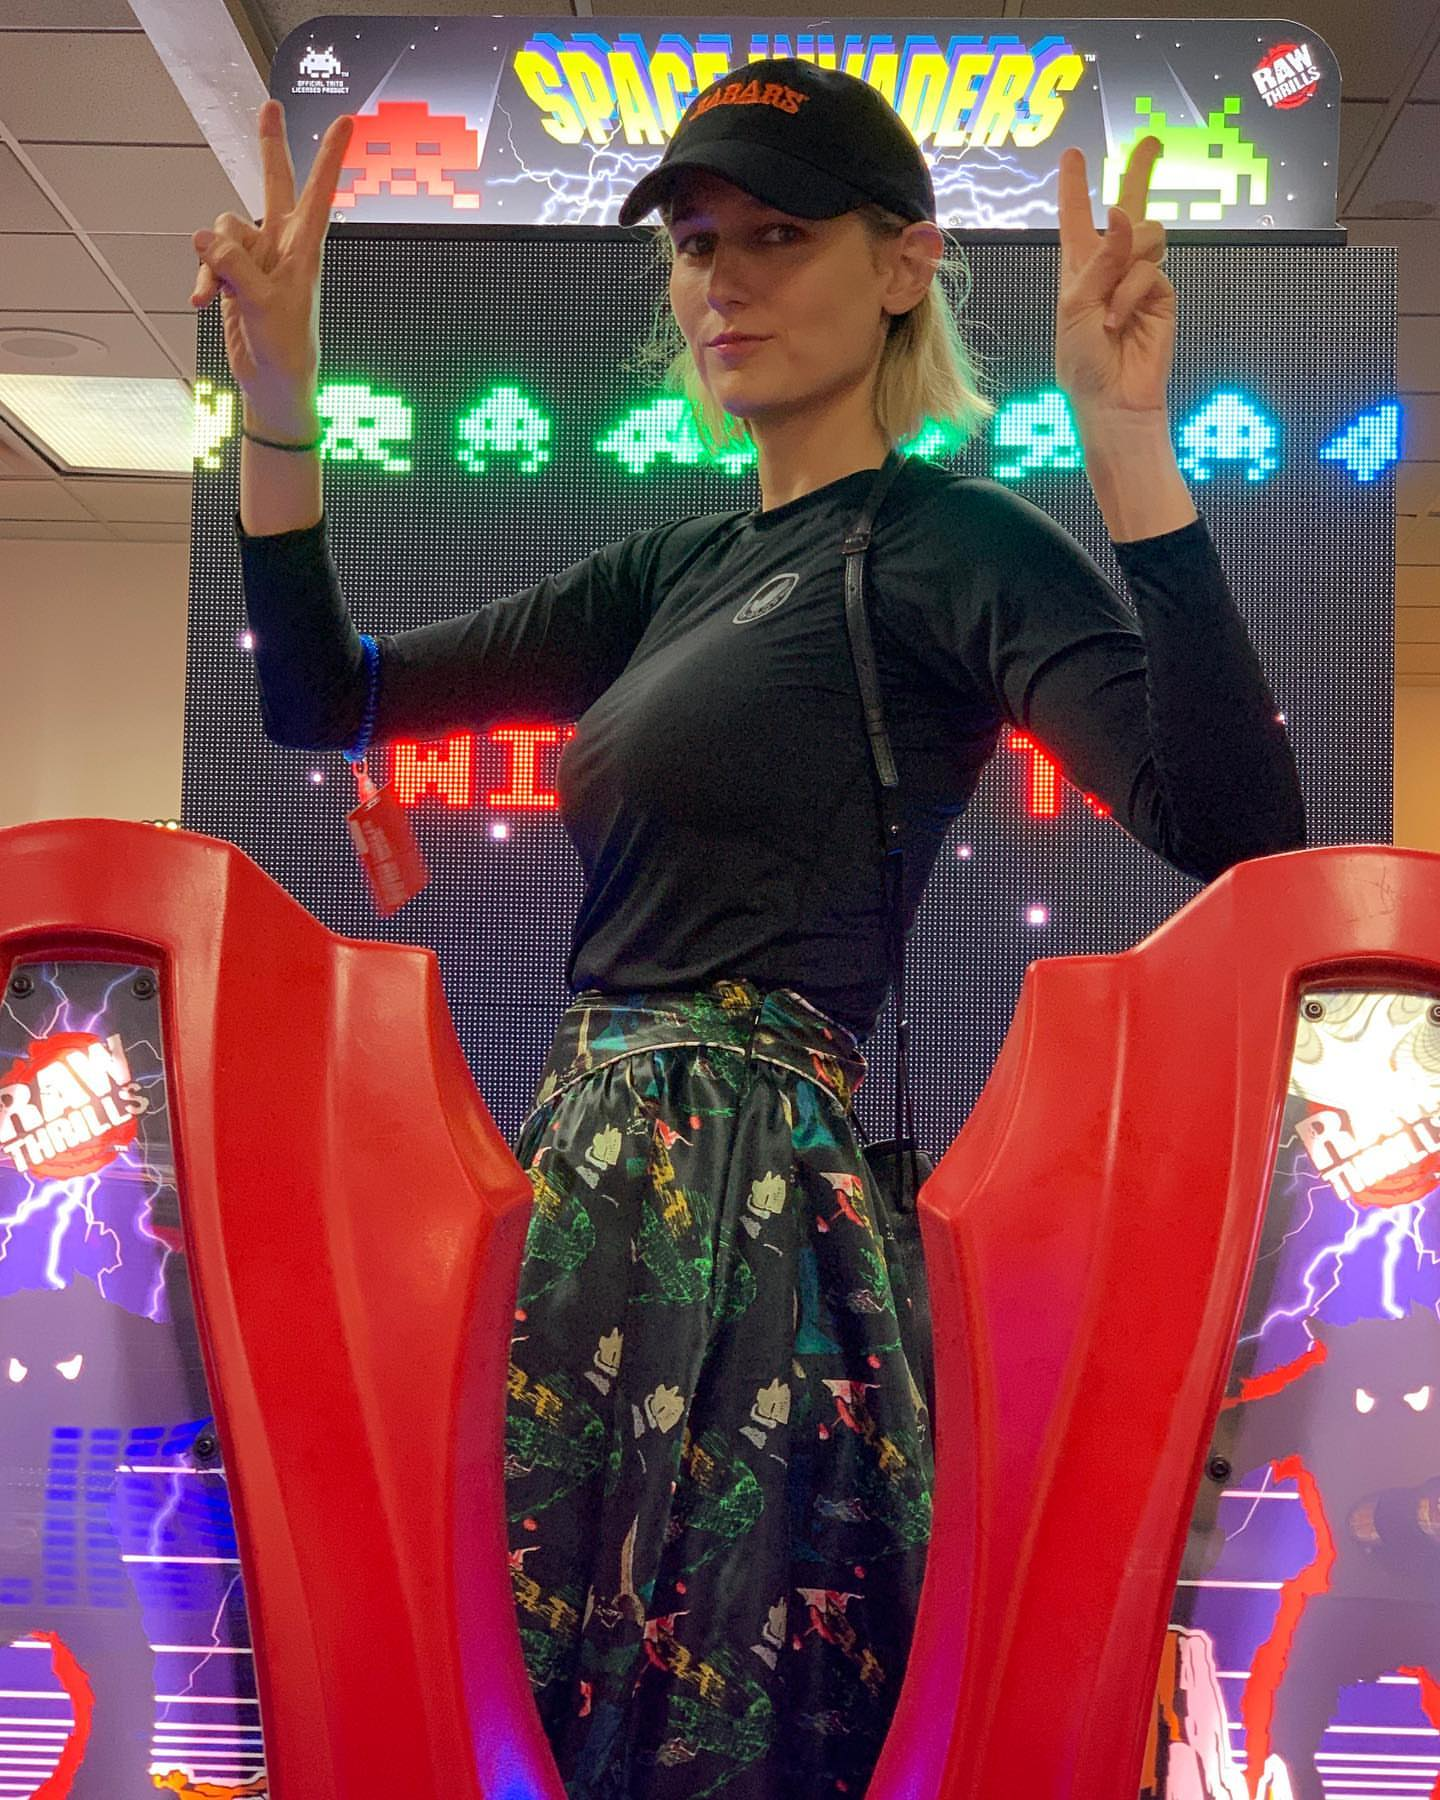 Leelee Sobieski - Social media